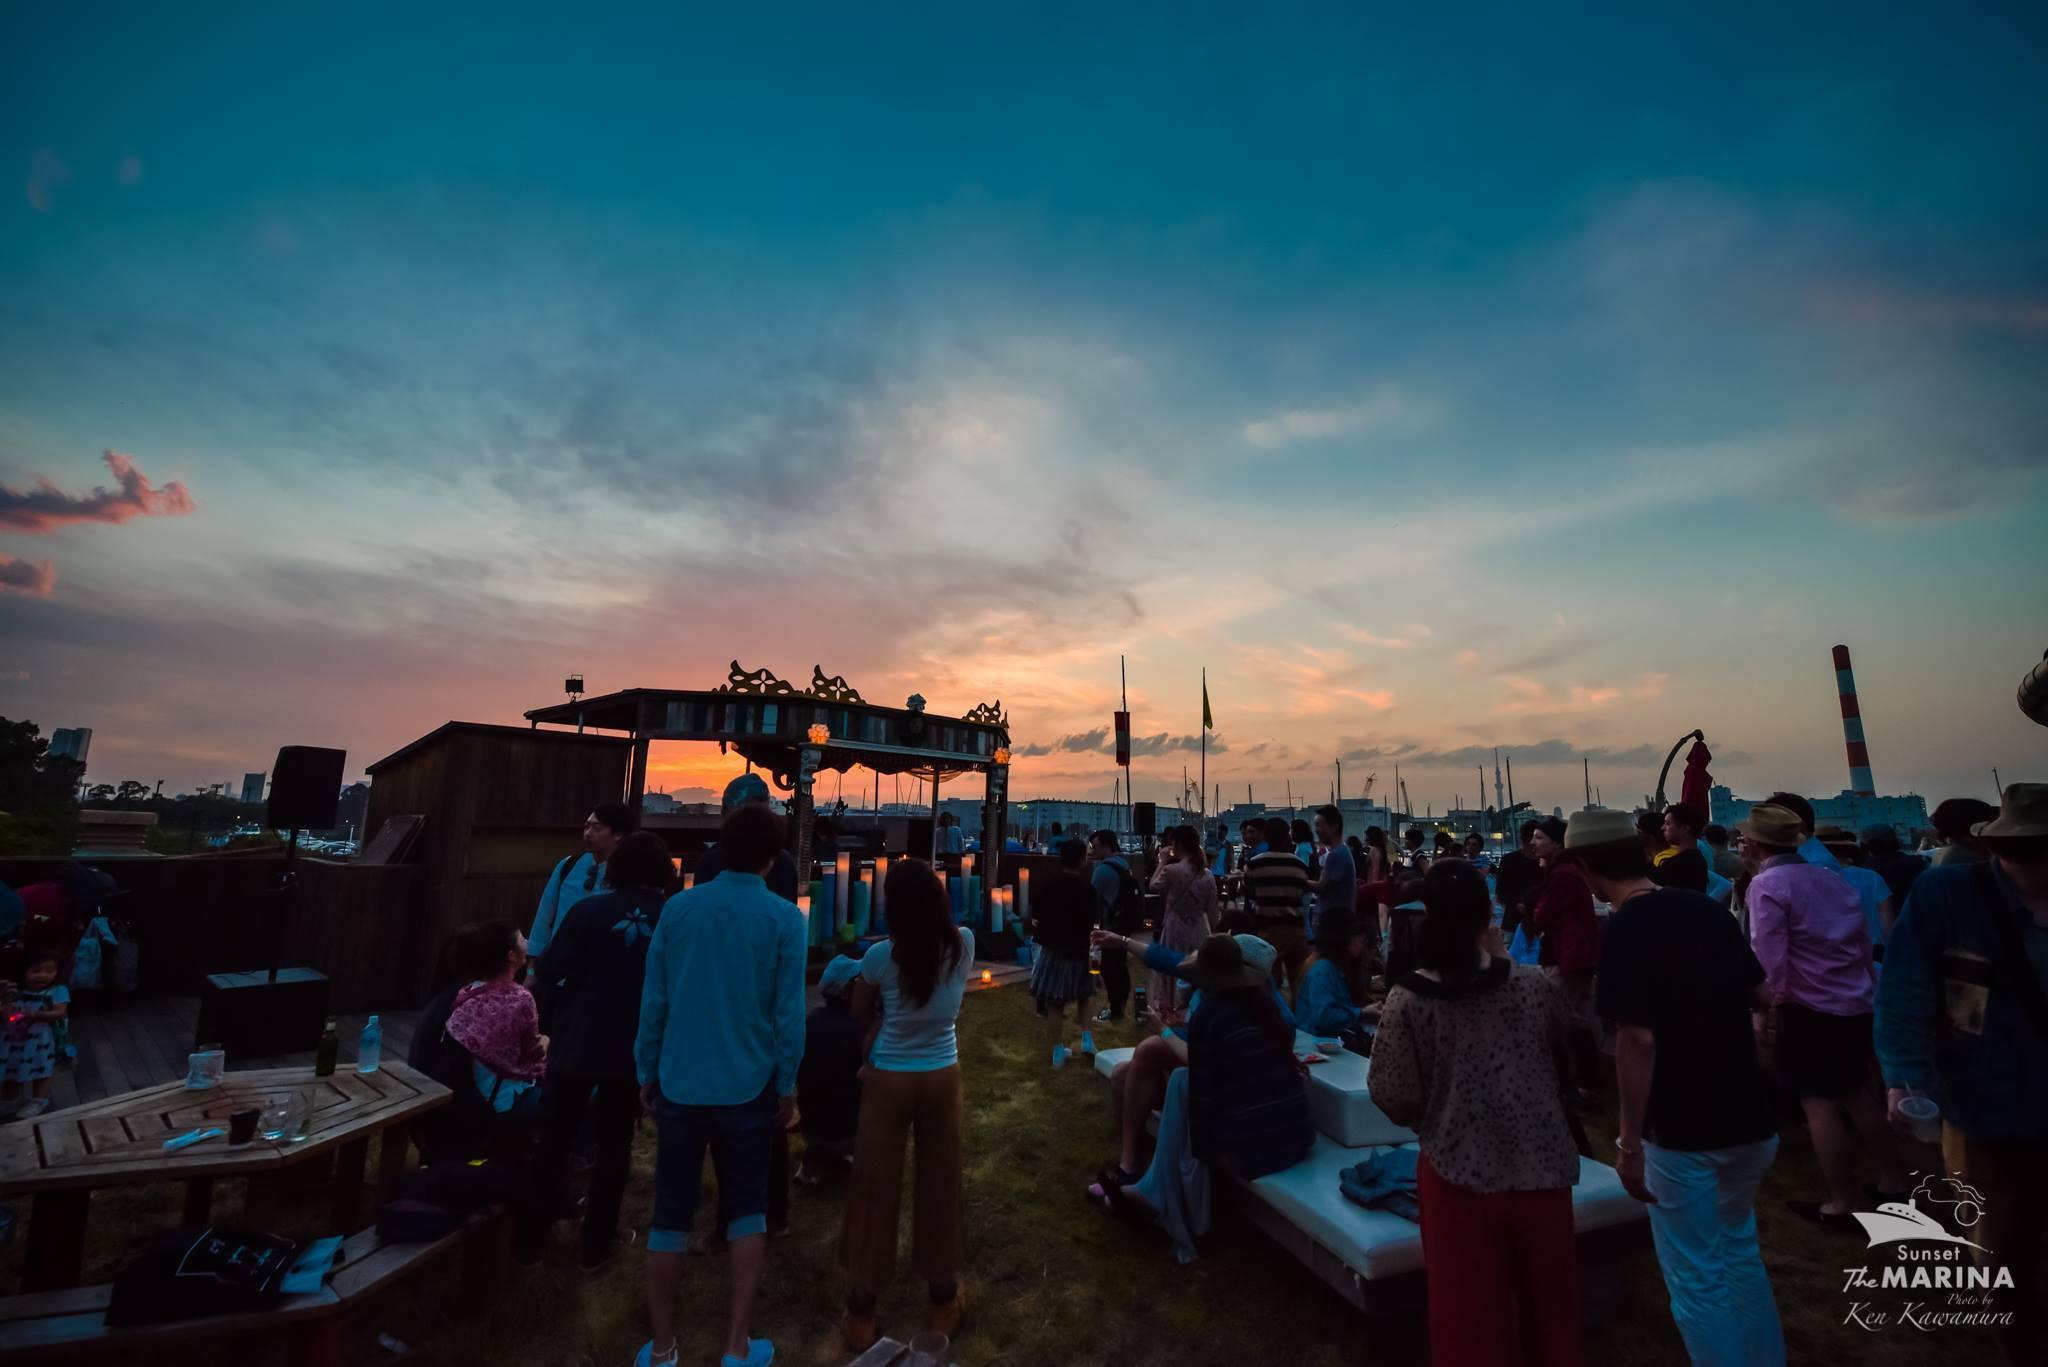 Sunset The MARINA vol.10~ FIKA ~